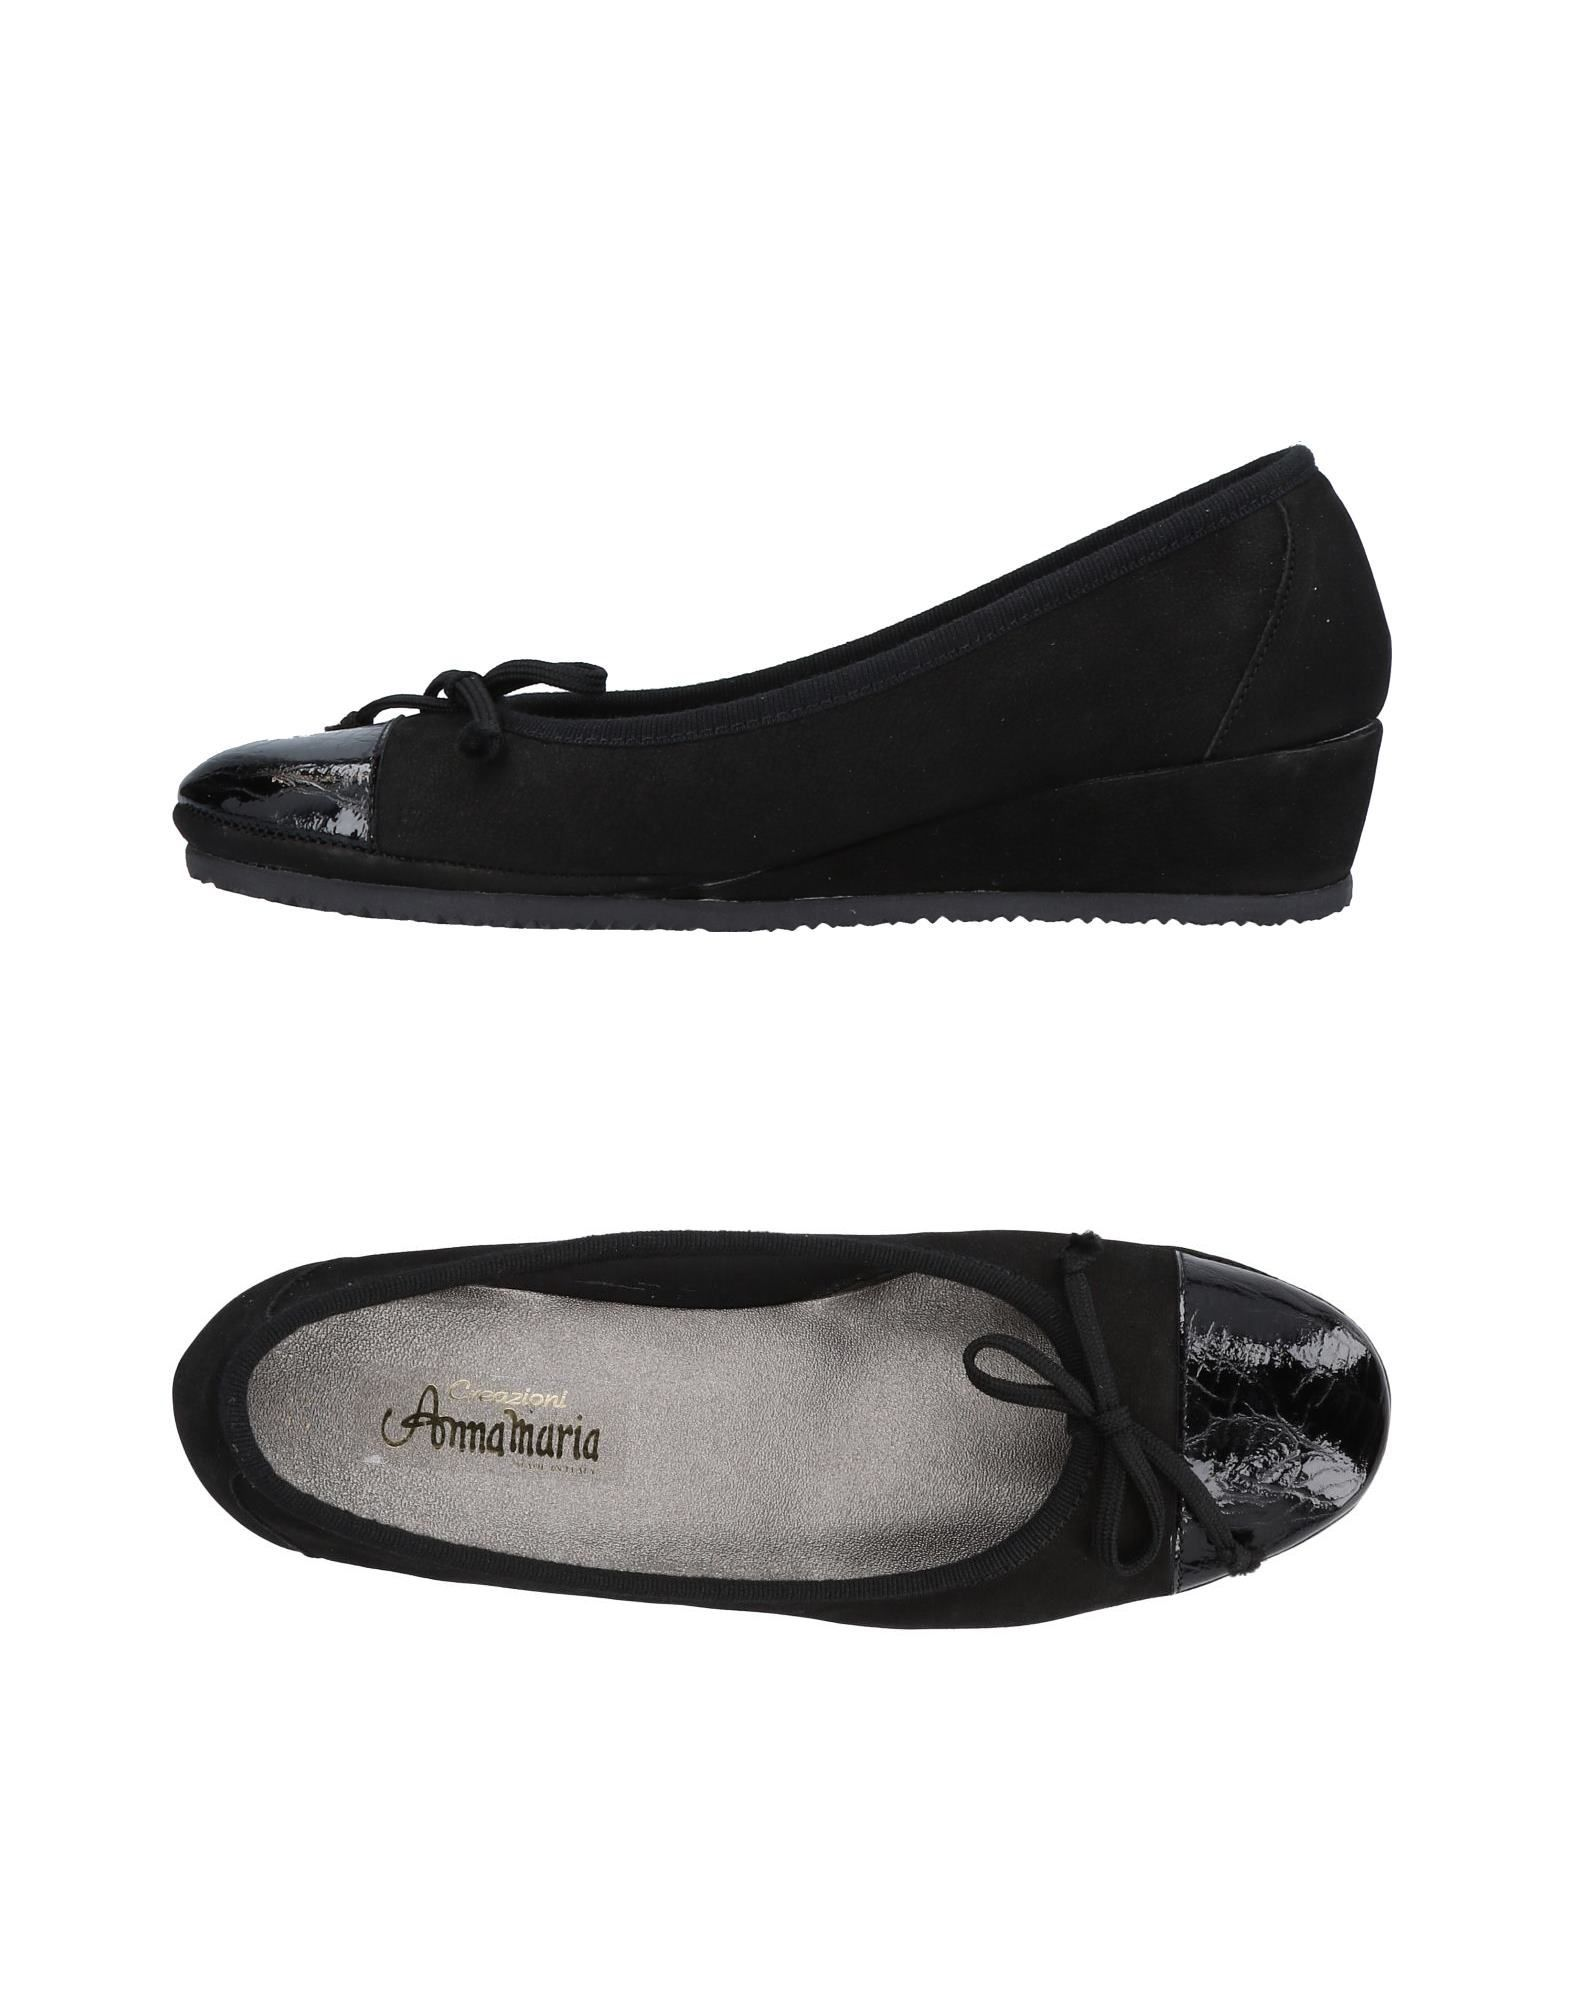 Mocassino Calpierre Donna - scarpe 11459477TA Nuove offerte e scarpe - comode 1d8308